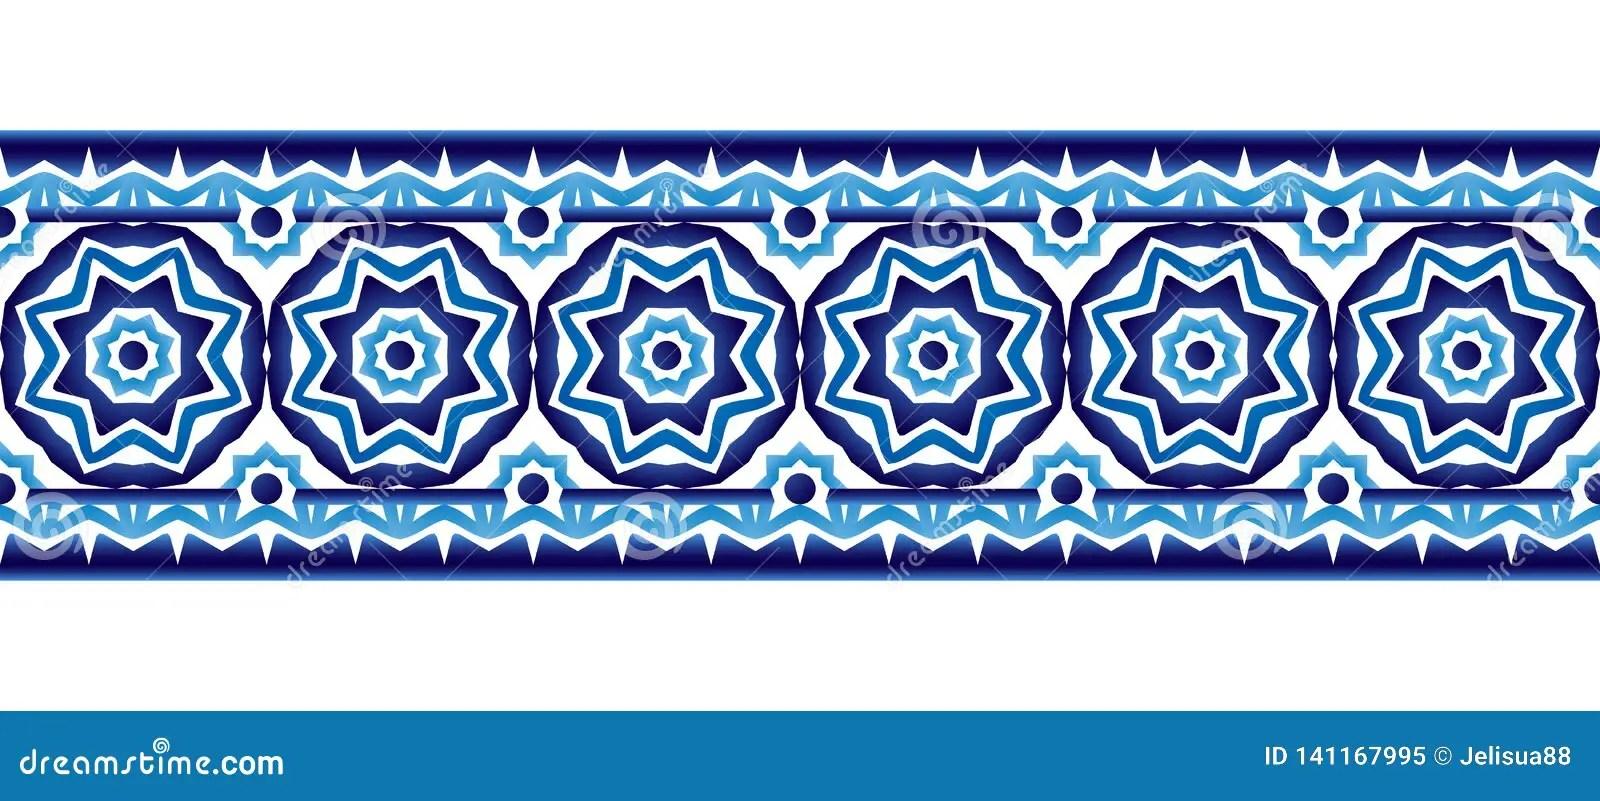 https www dreamstime com ceramic tile border pattern islamic indian arabic motifs damask seamless porcelain ethnic bohemian background abstract flower image141167995